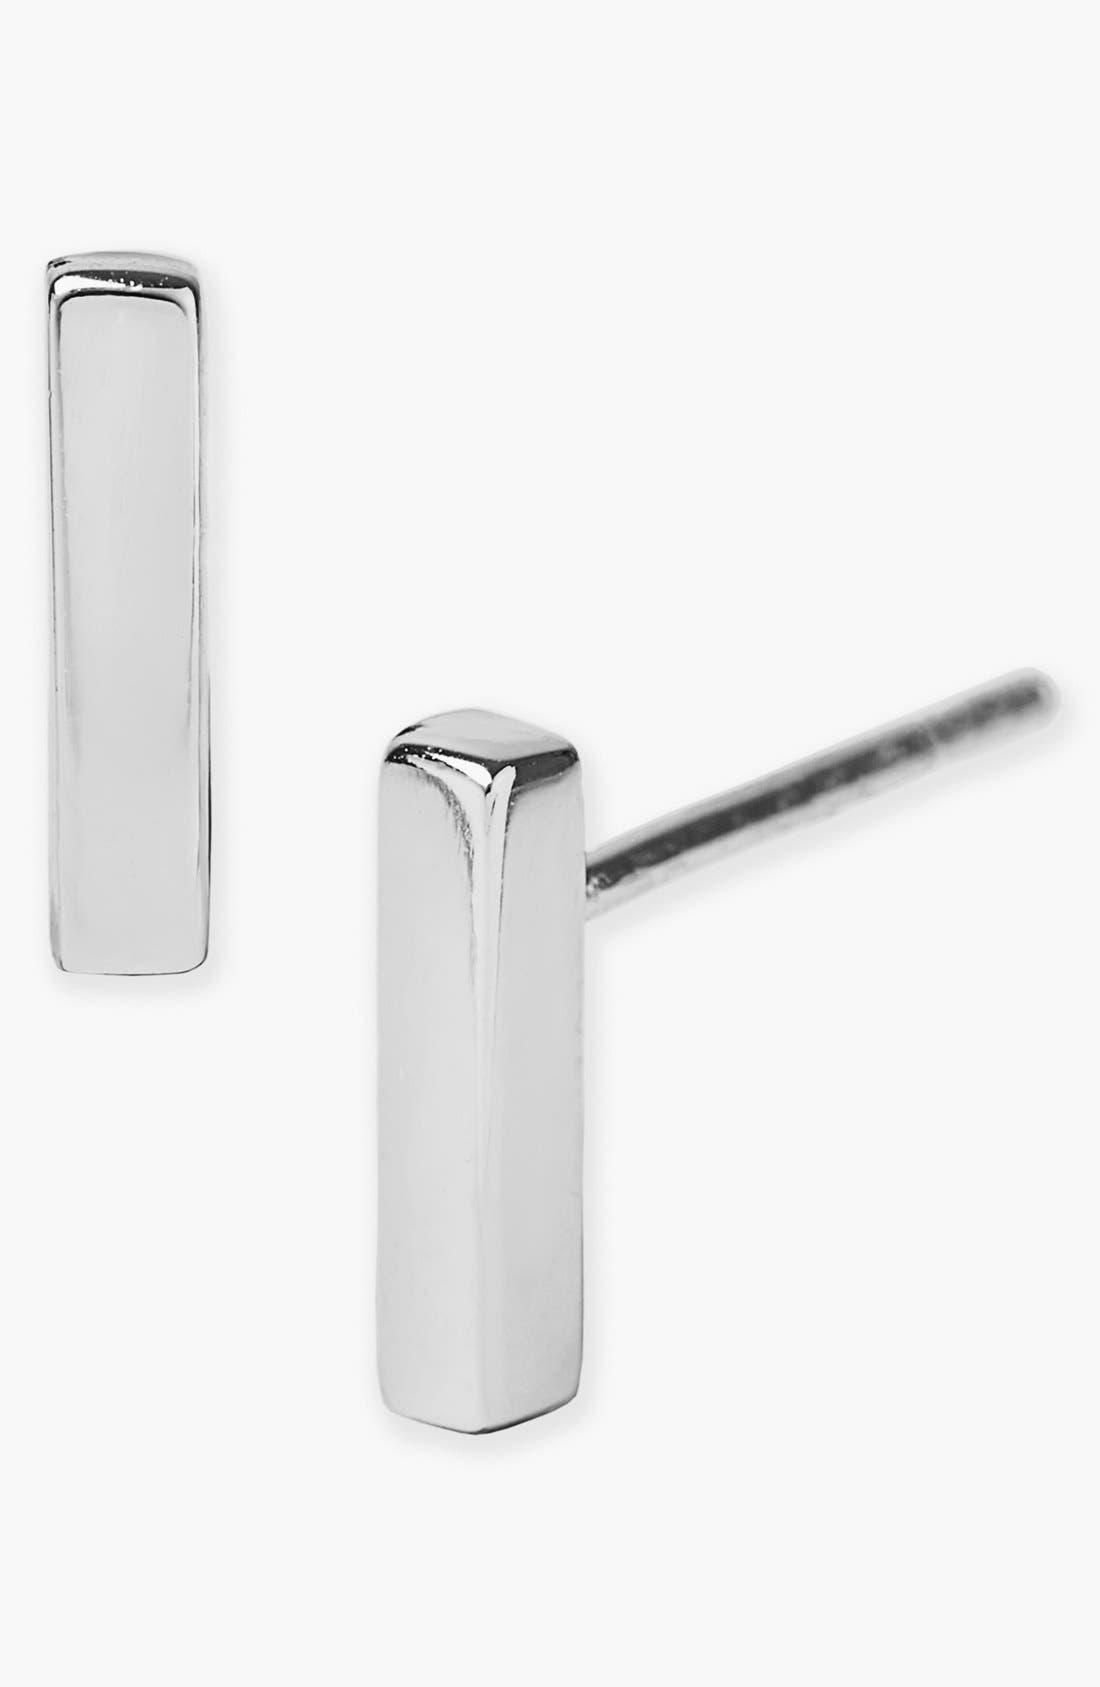 Bar Stud Earrings,                         Main,                         color, Silver